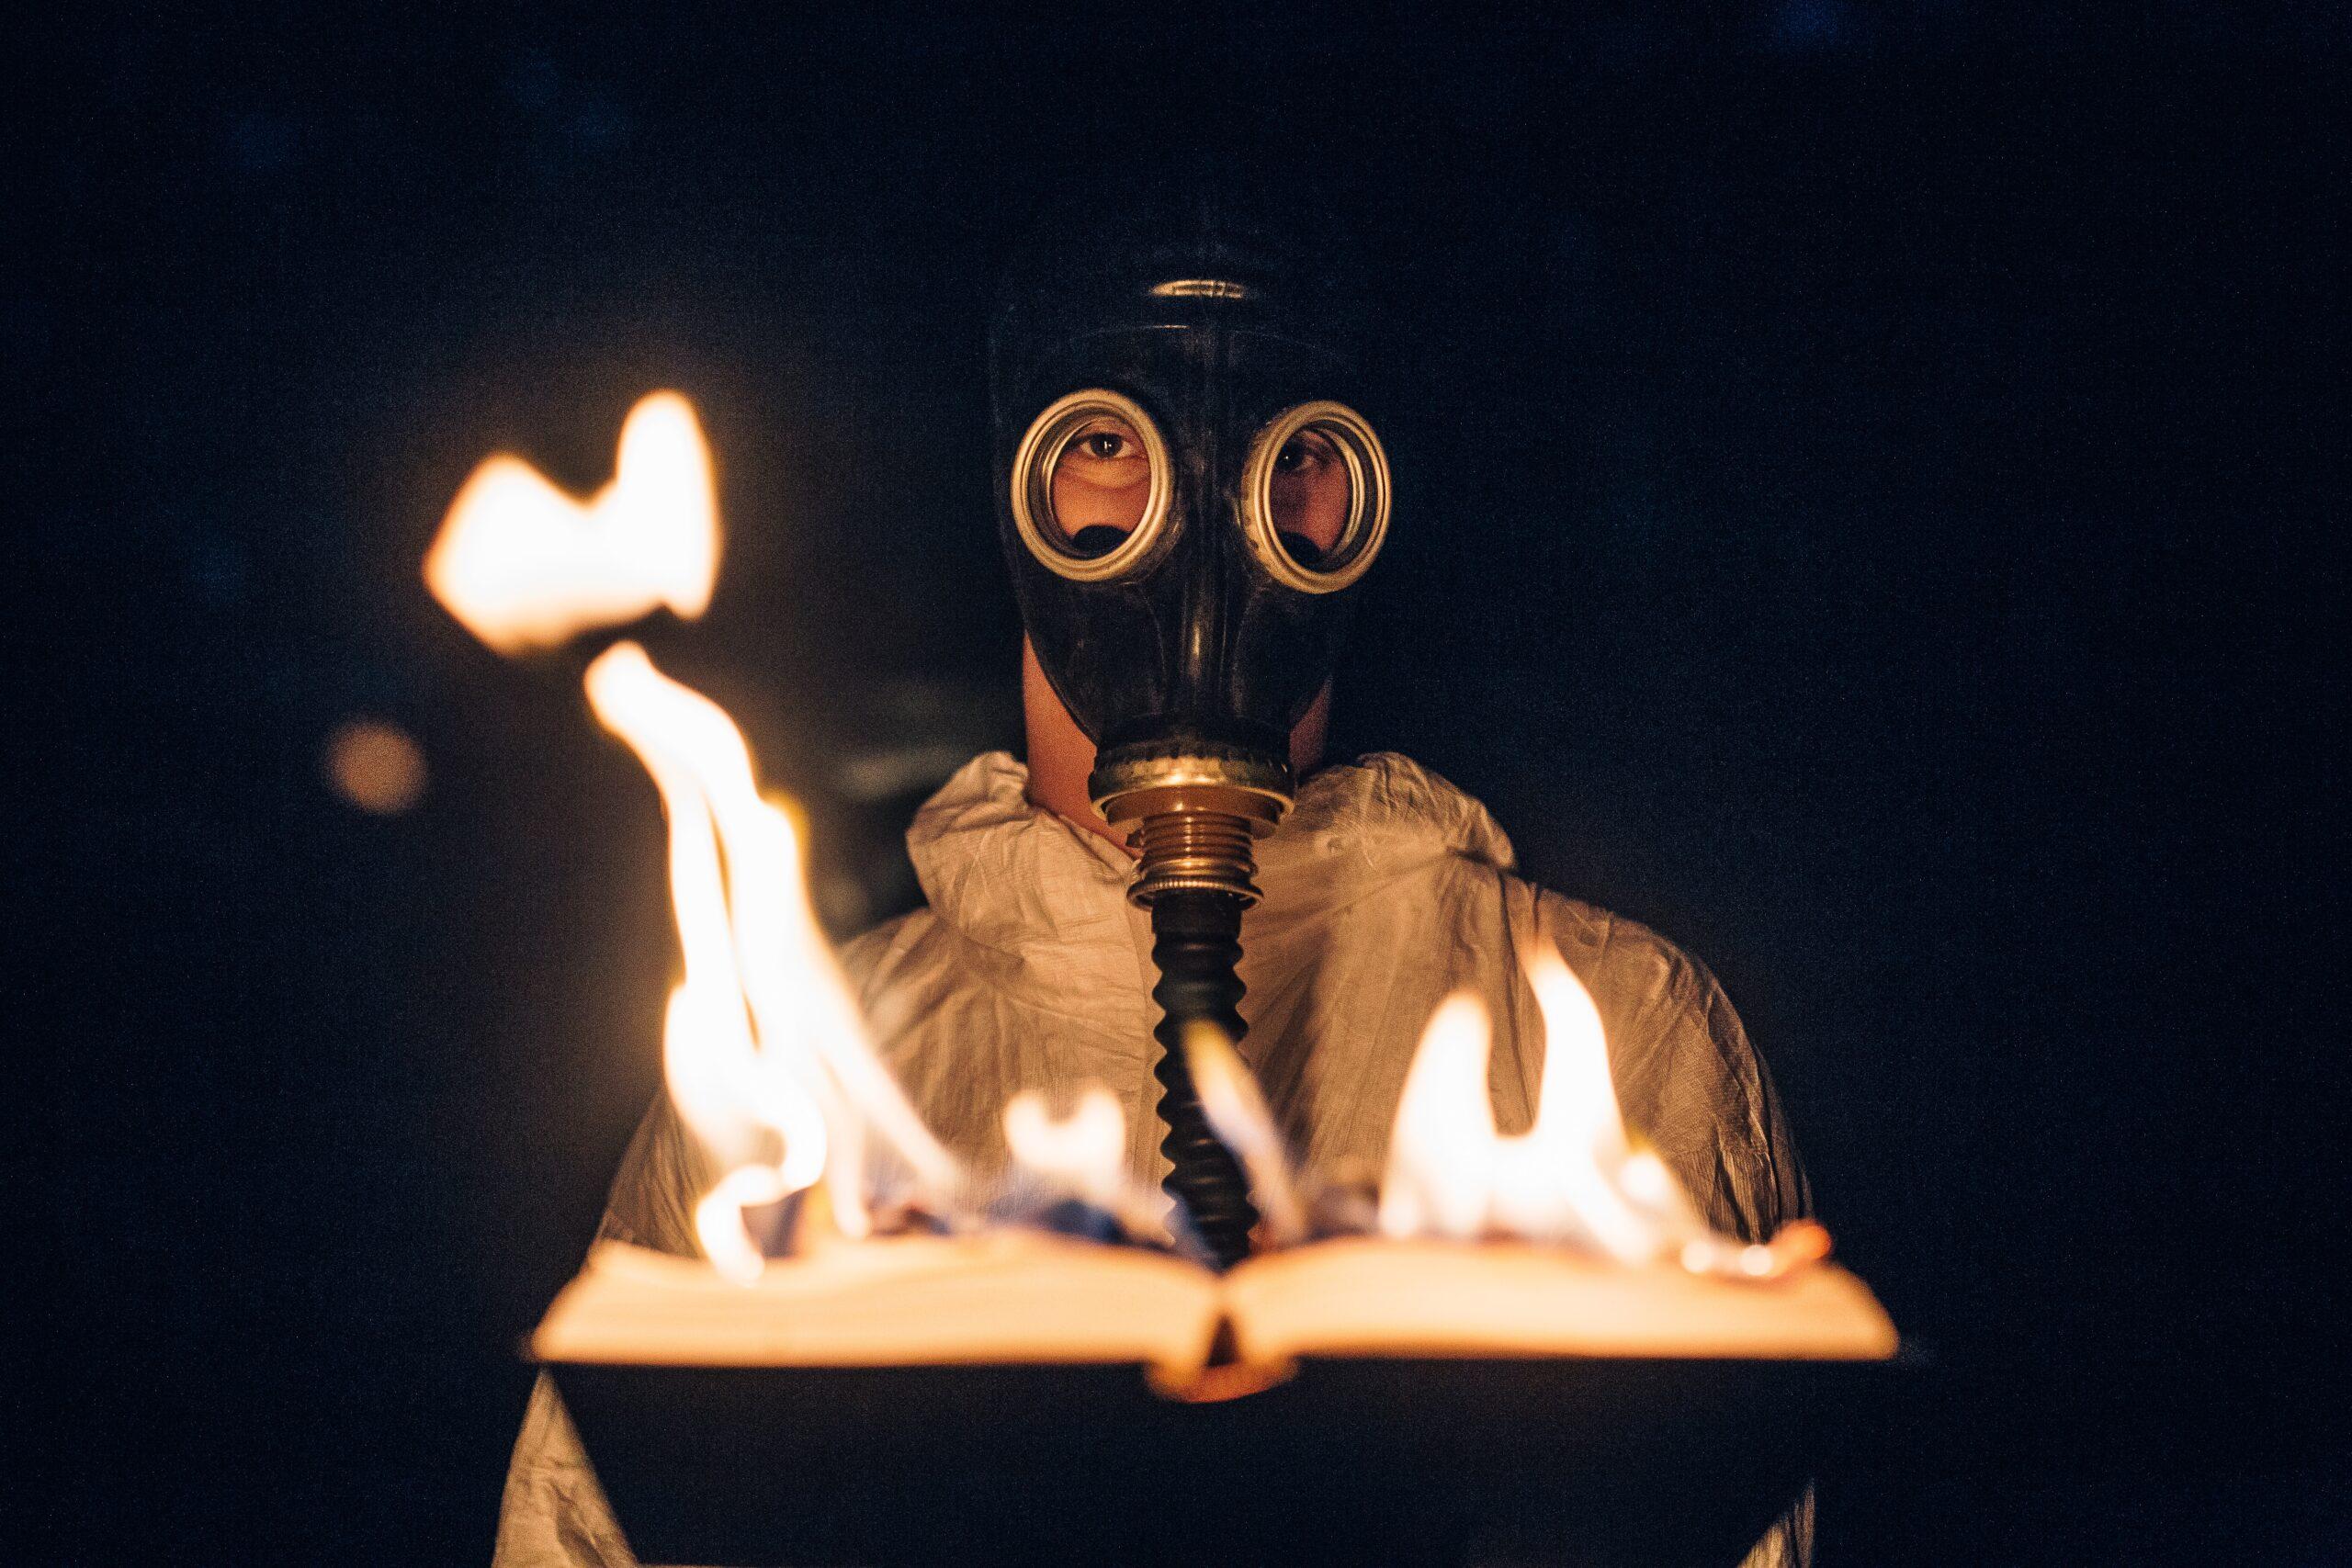 kyle-cleveland-burning-book-gas-mask.jpg